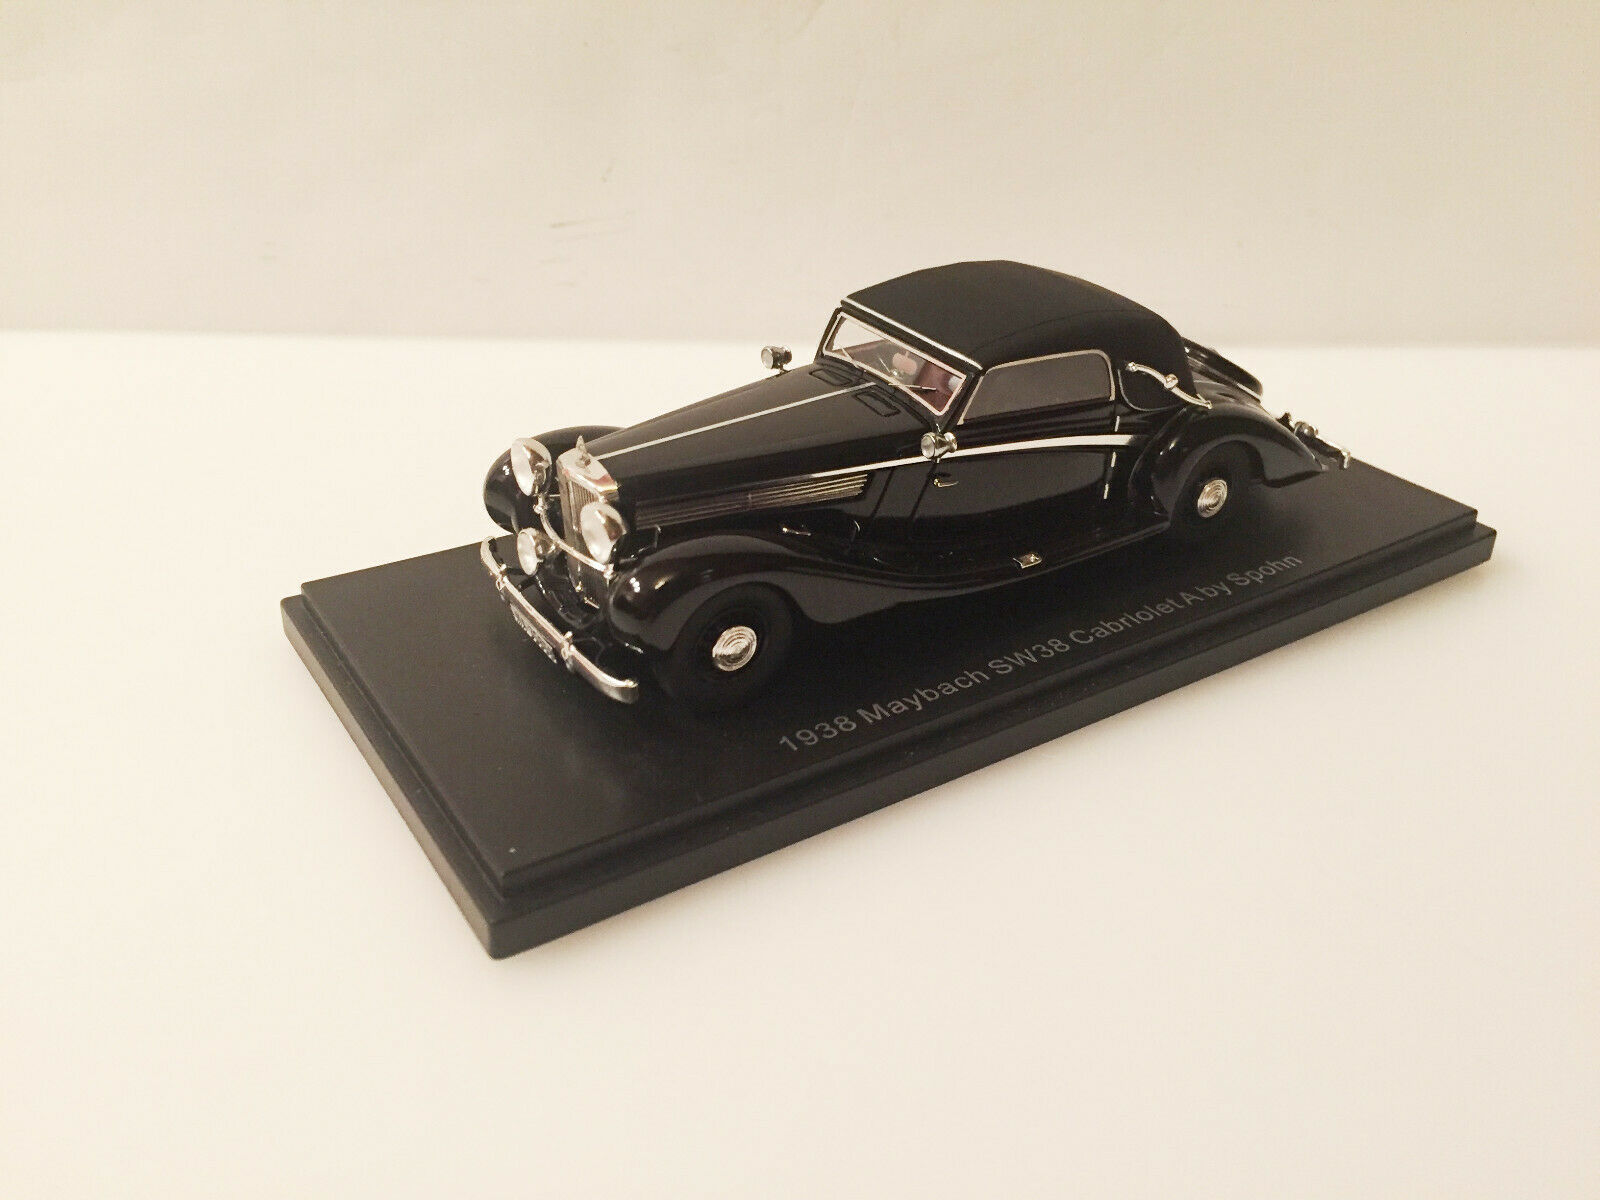 Esval 1938 Maybach SW38 Cabriolet a da Spohn Top Up 1 43 Nuovo